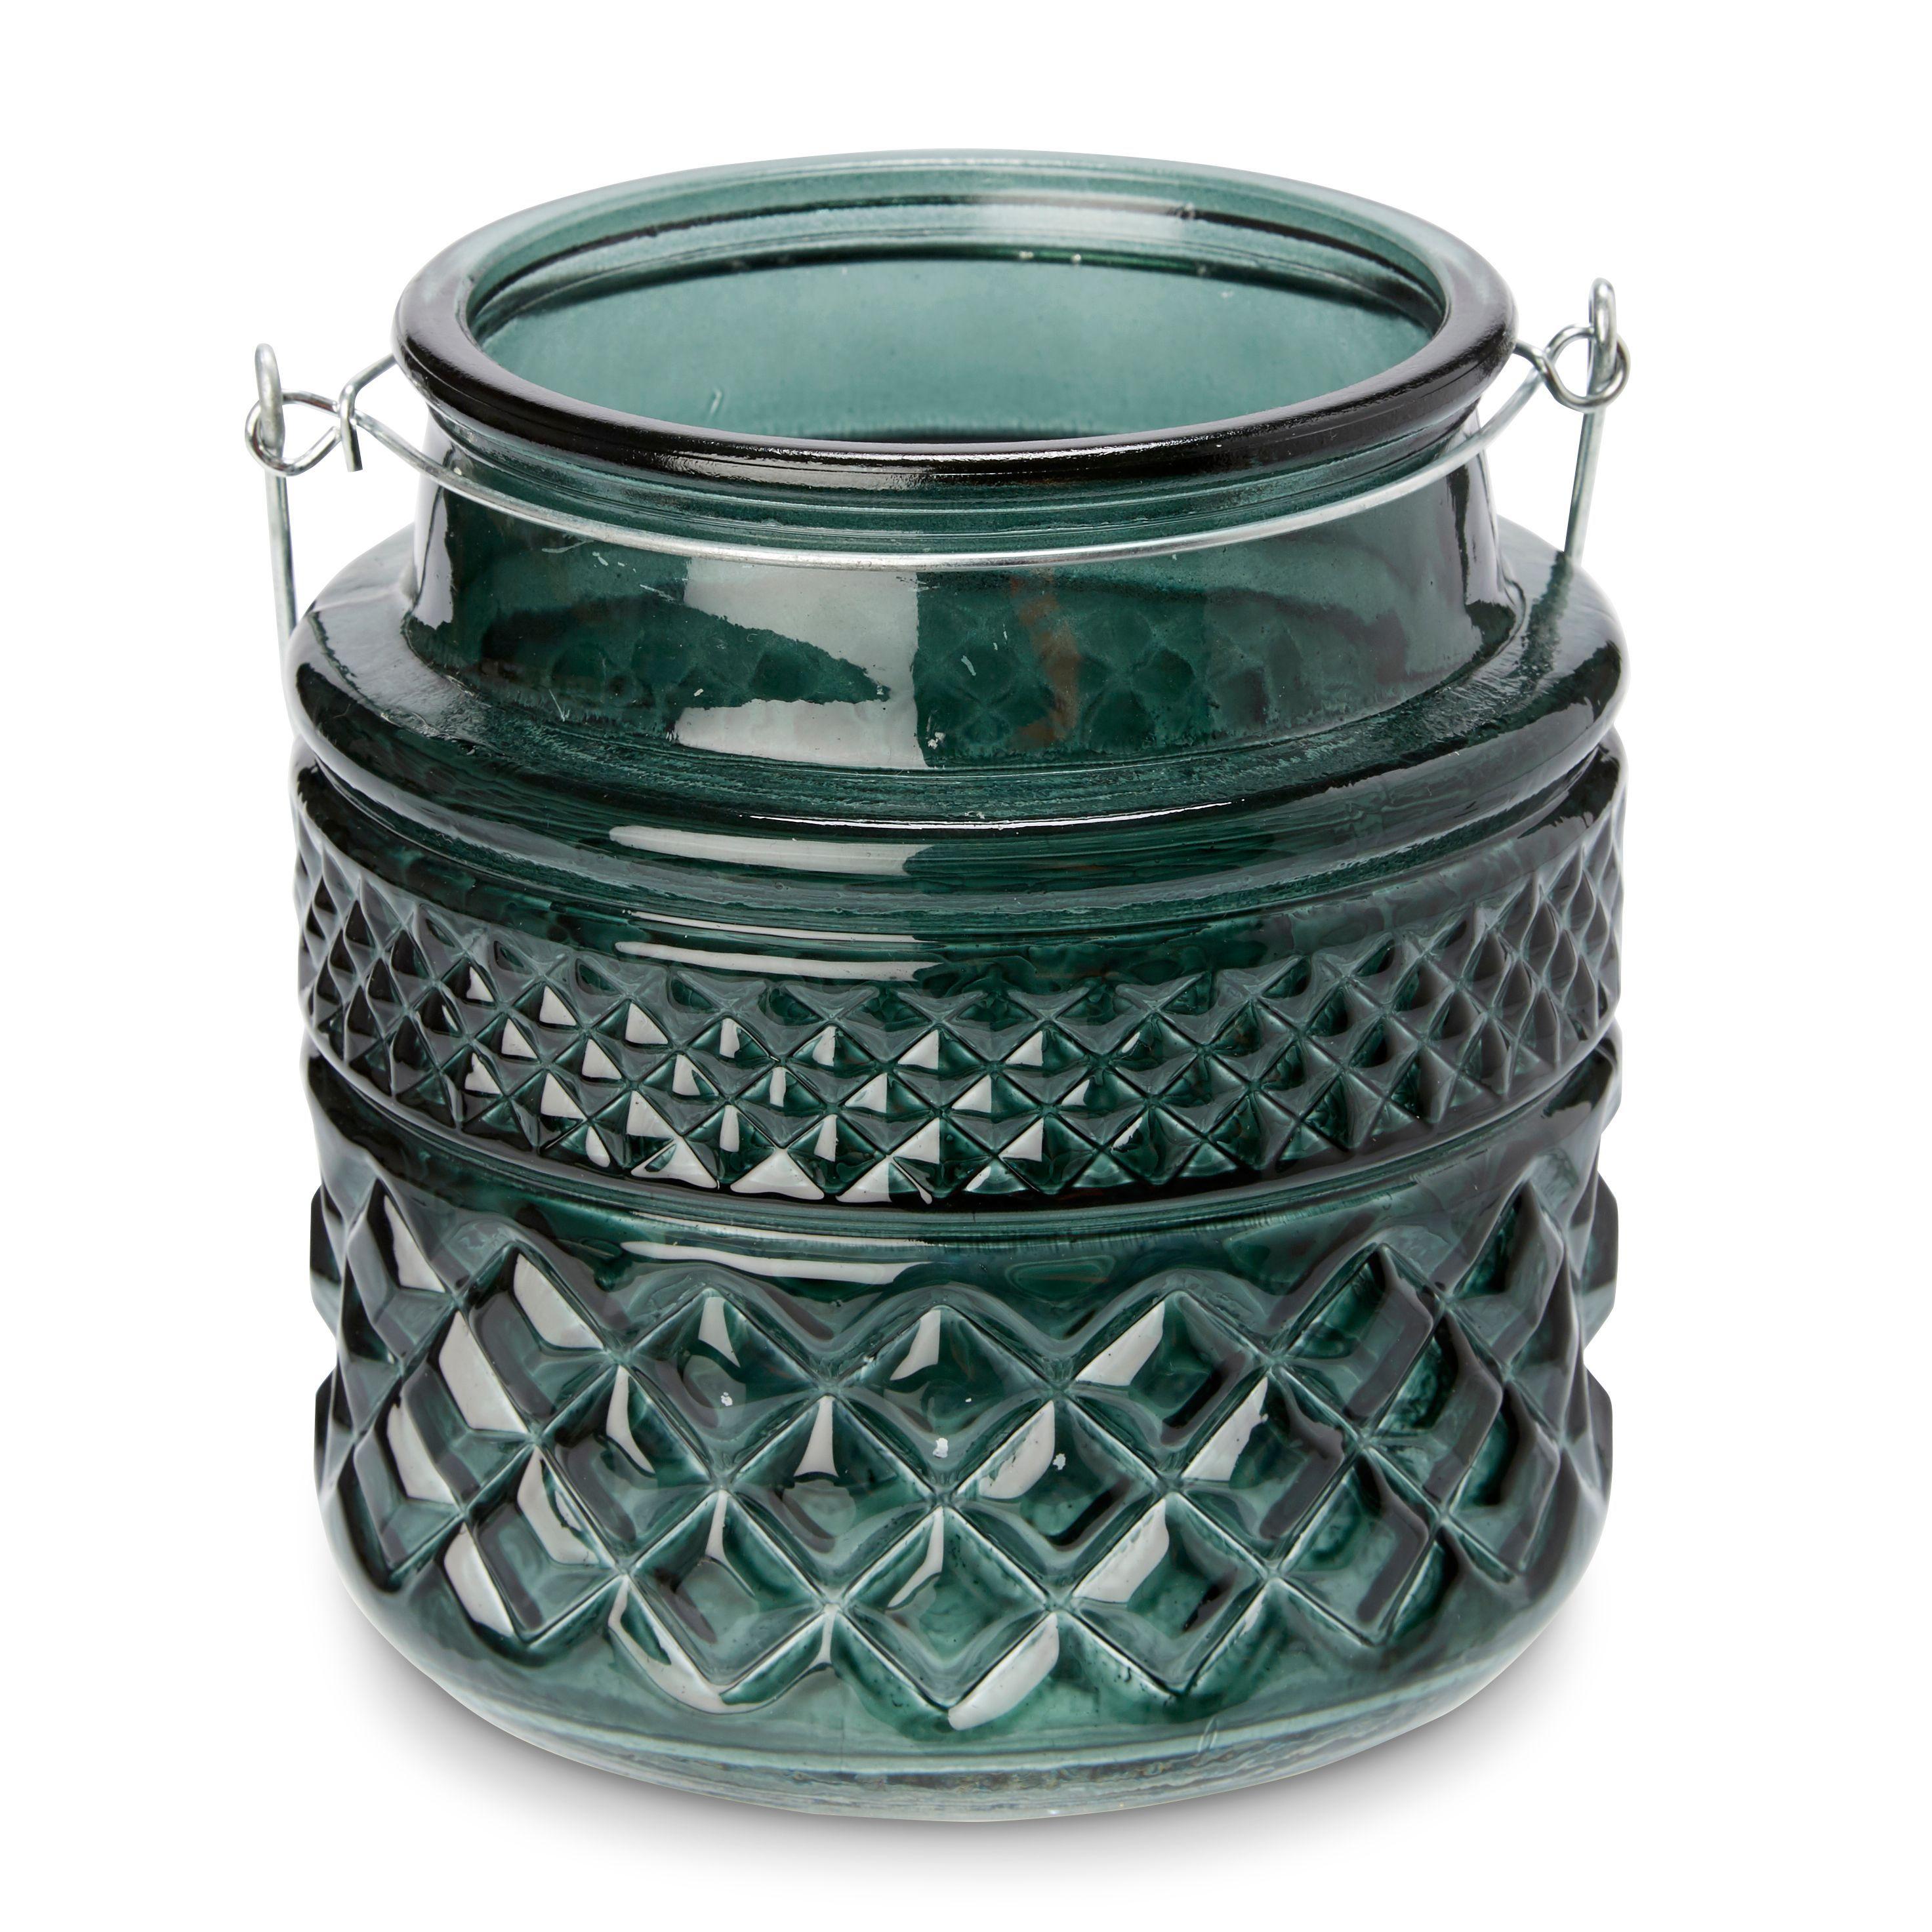 Green Embossed Glass Tealight Holder, Medium